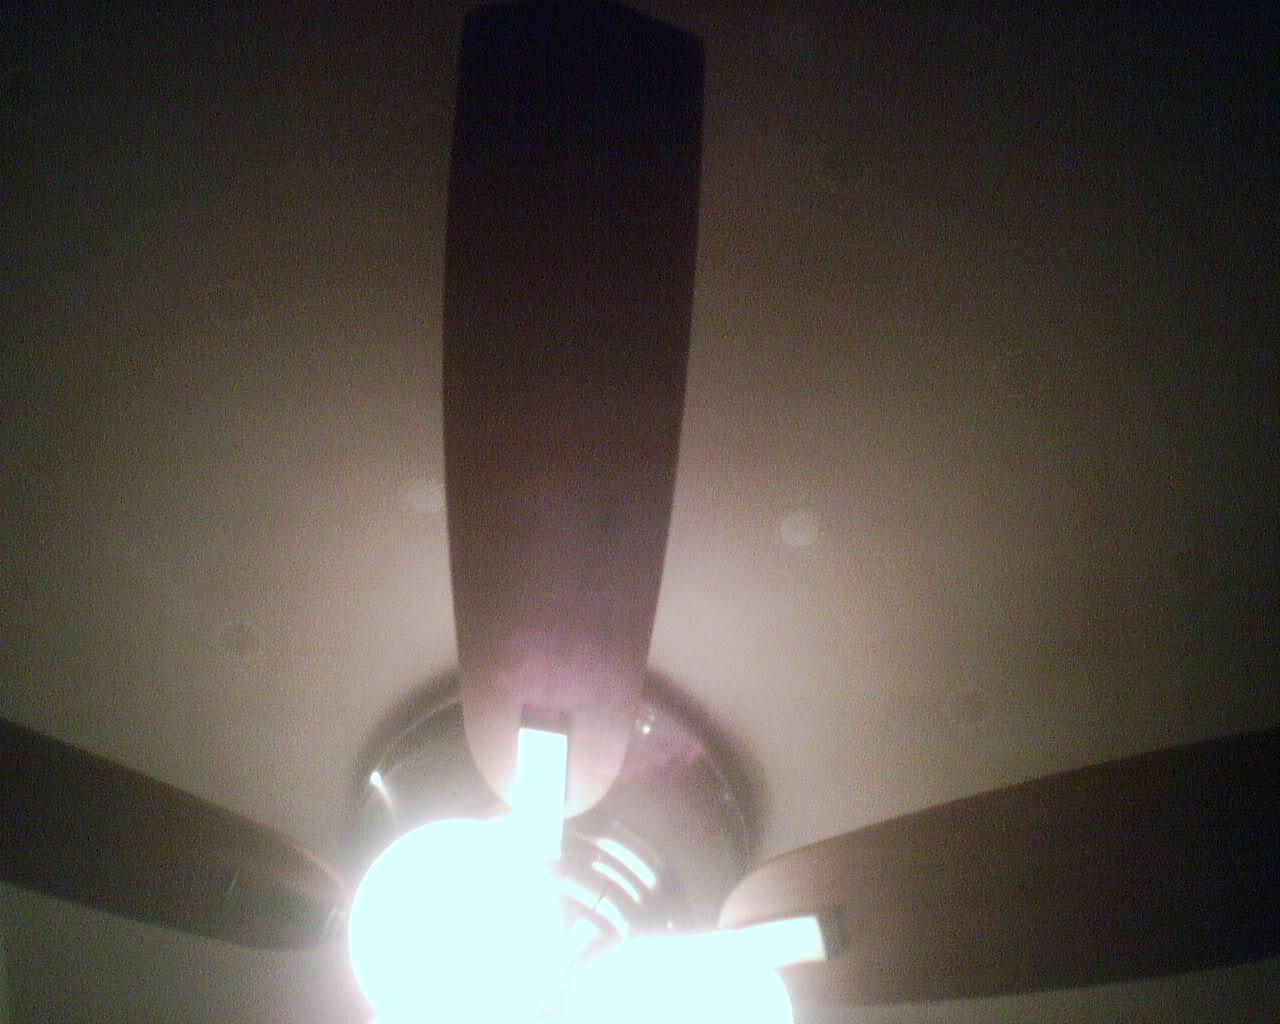 Wallpapering Ceilings With A Fan Wallpaperlady 39 S Blog